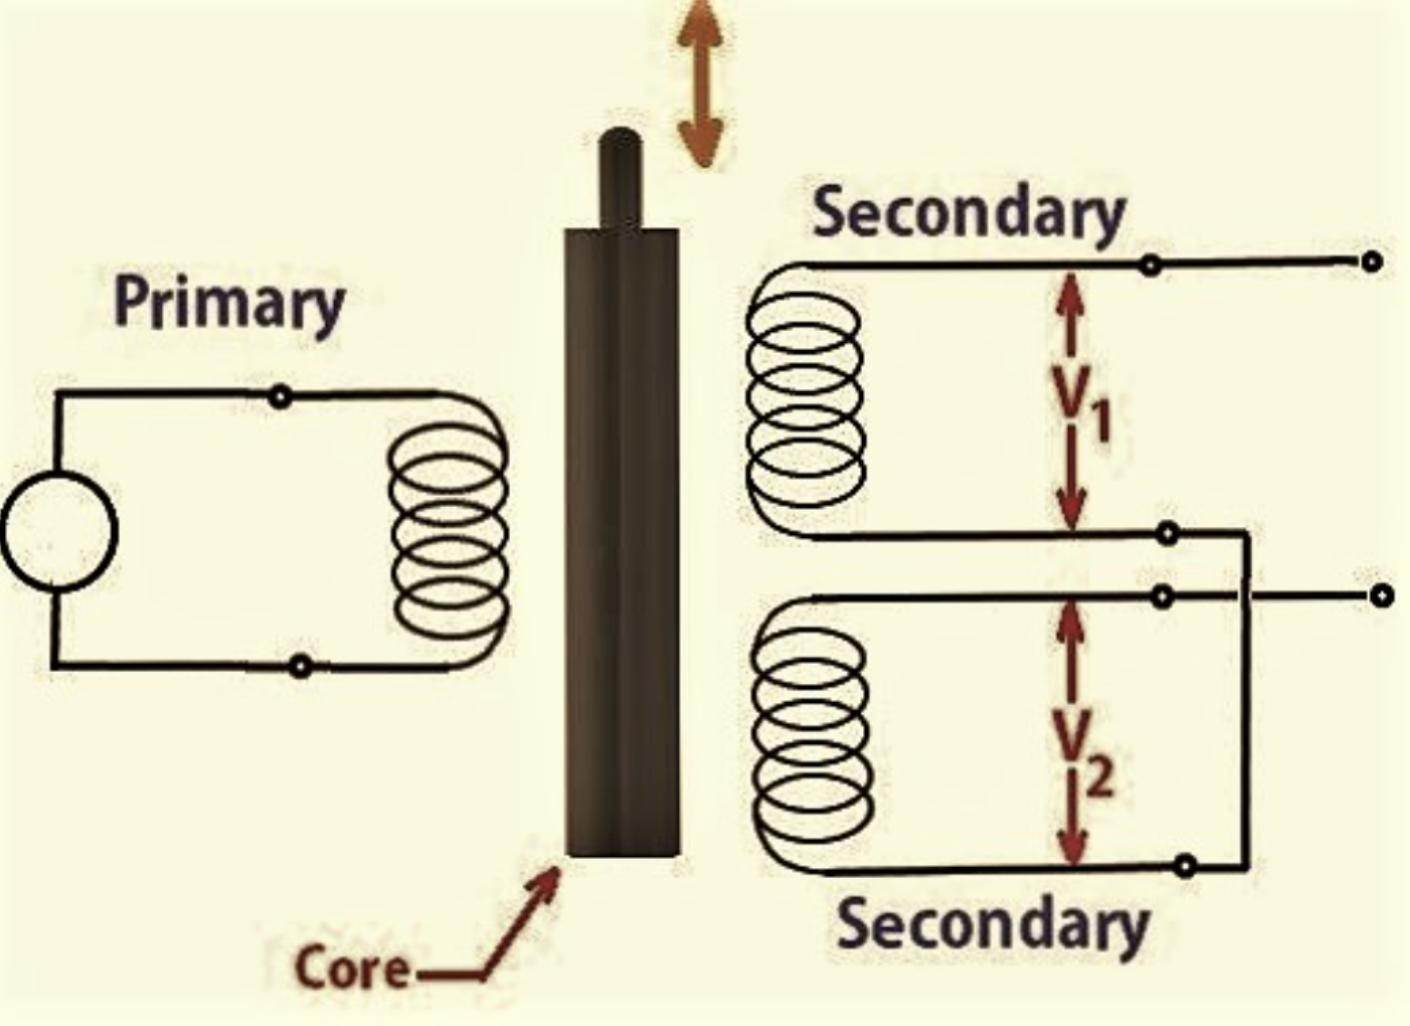 Micro LVDT (Linear Variable Differential Transformer) Sensor